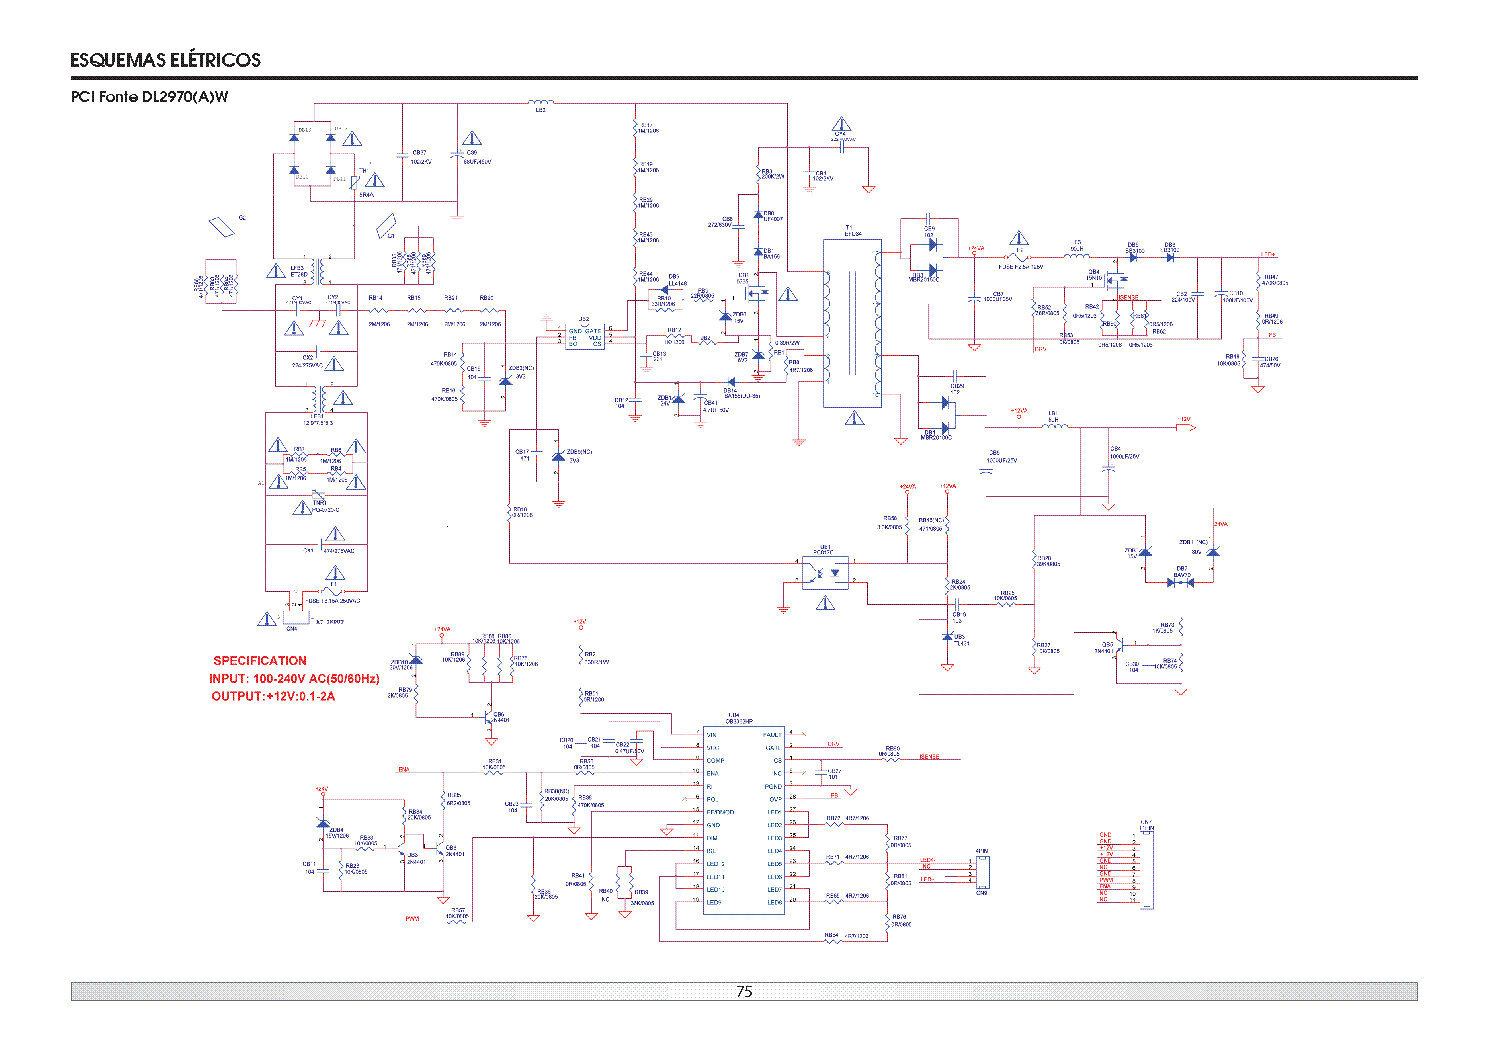 toshiba led tv schematic diagram schematic diagramtoshiba led tv schematic  diagram all wiring diagram toshiba 32